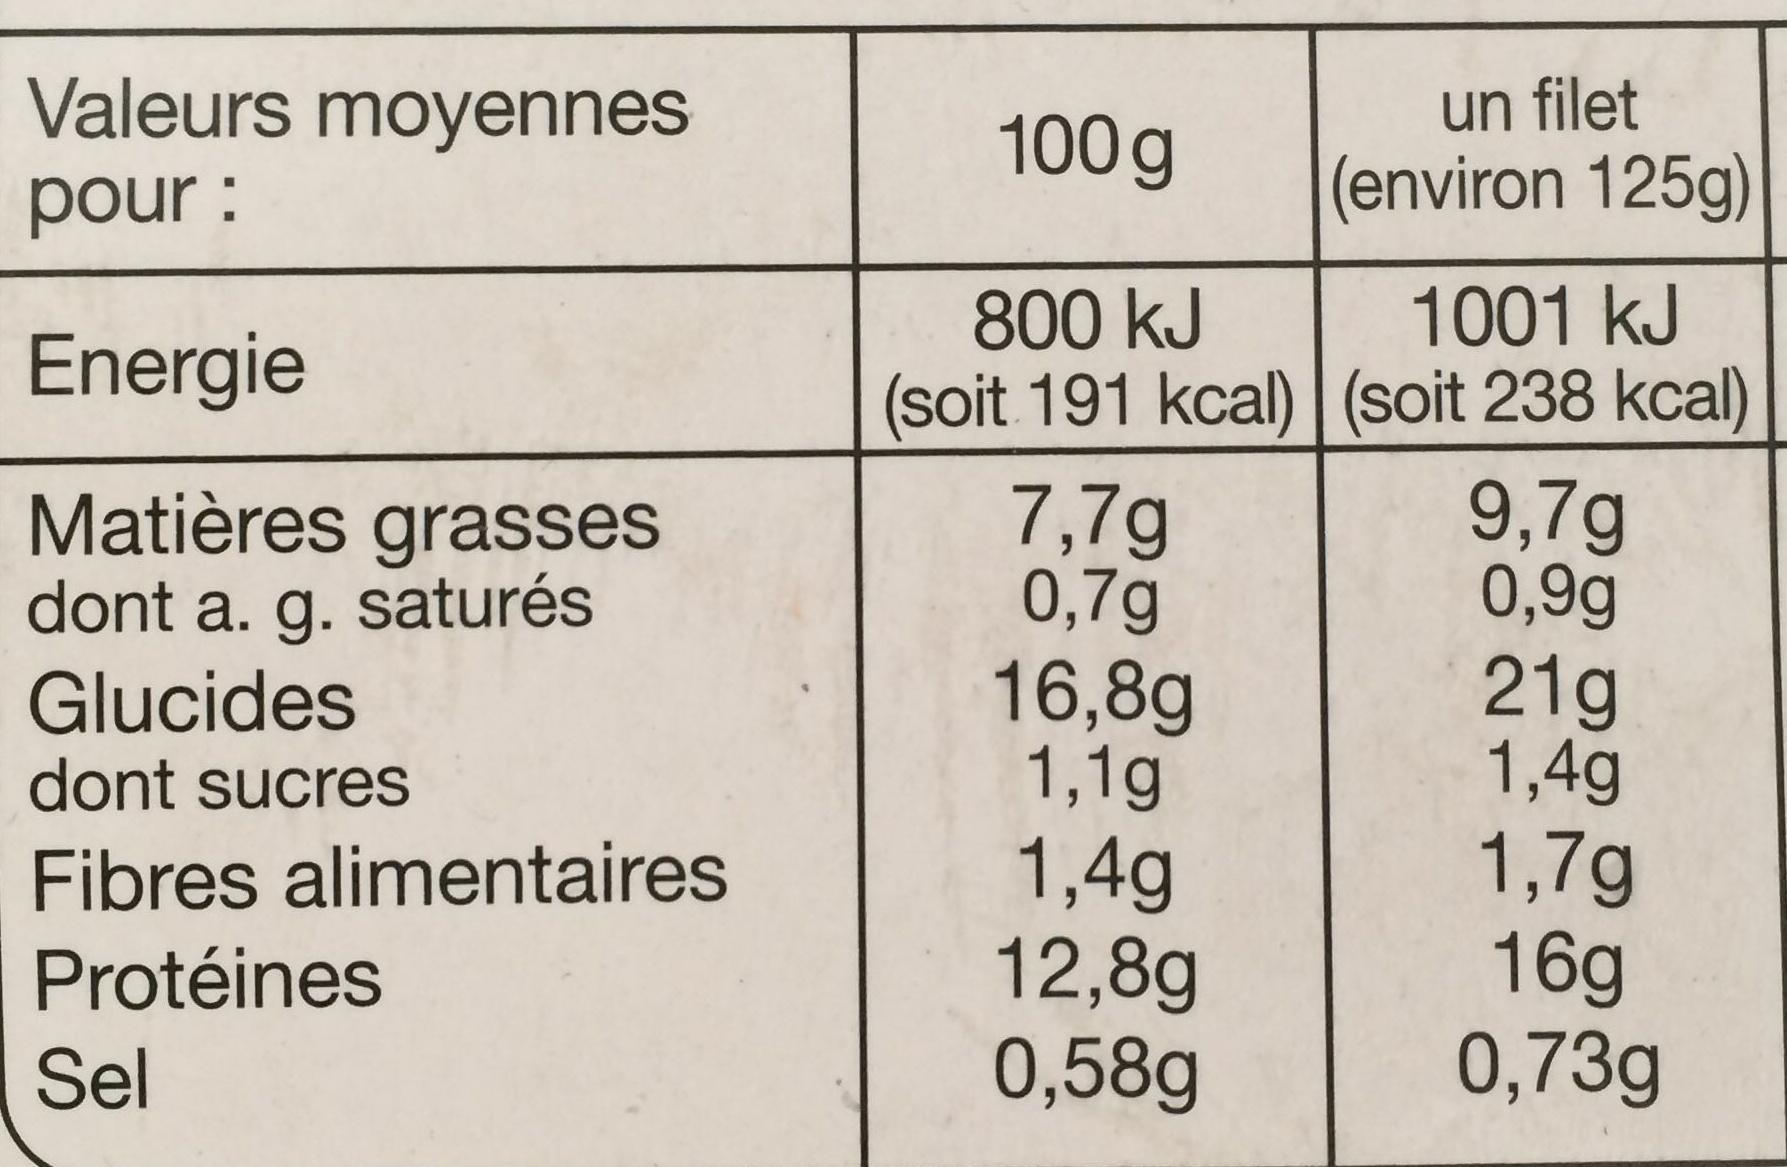 Filets de Cabillaud en panure croustillante - Voedigswaarden